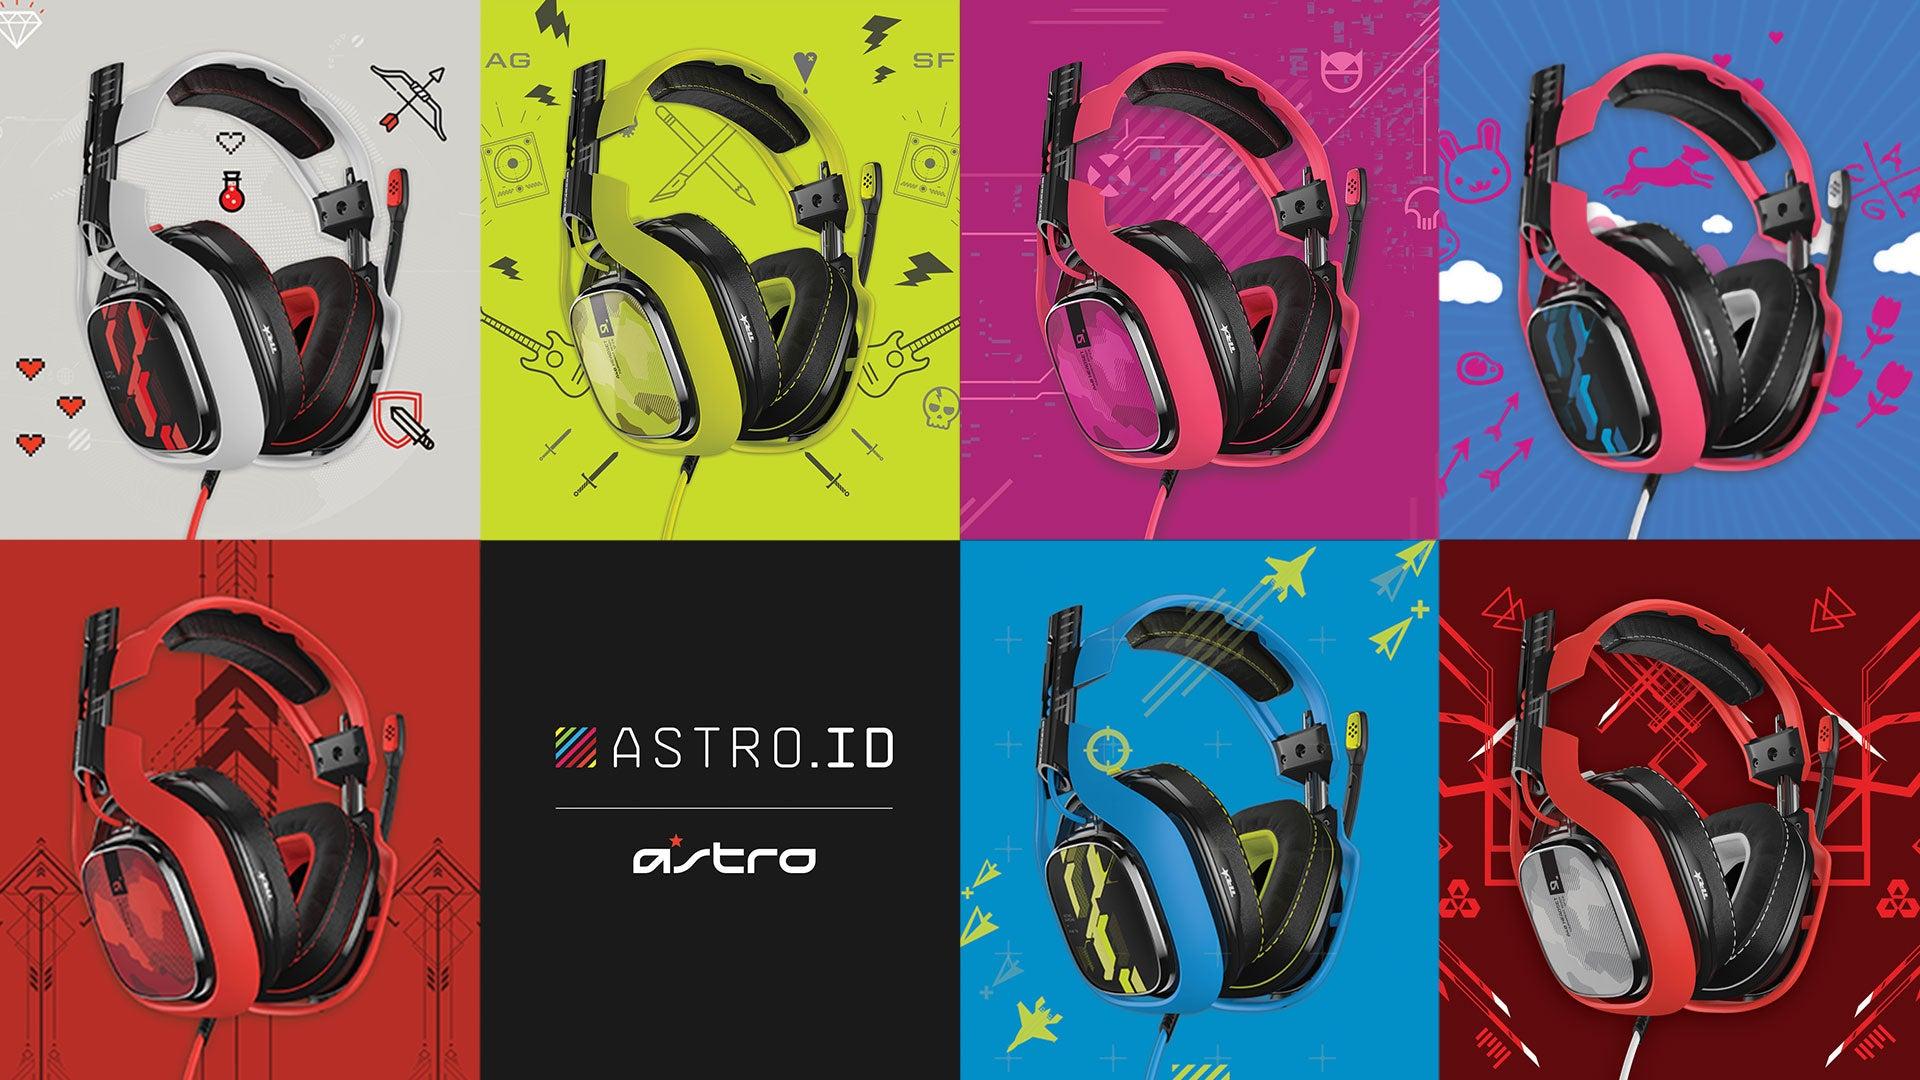 ASTRO.id